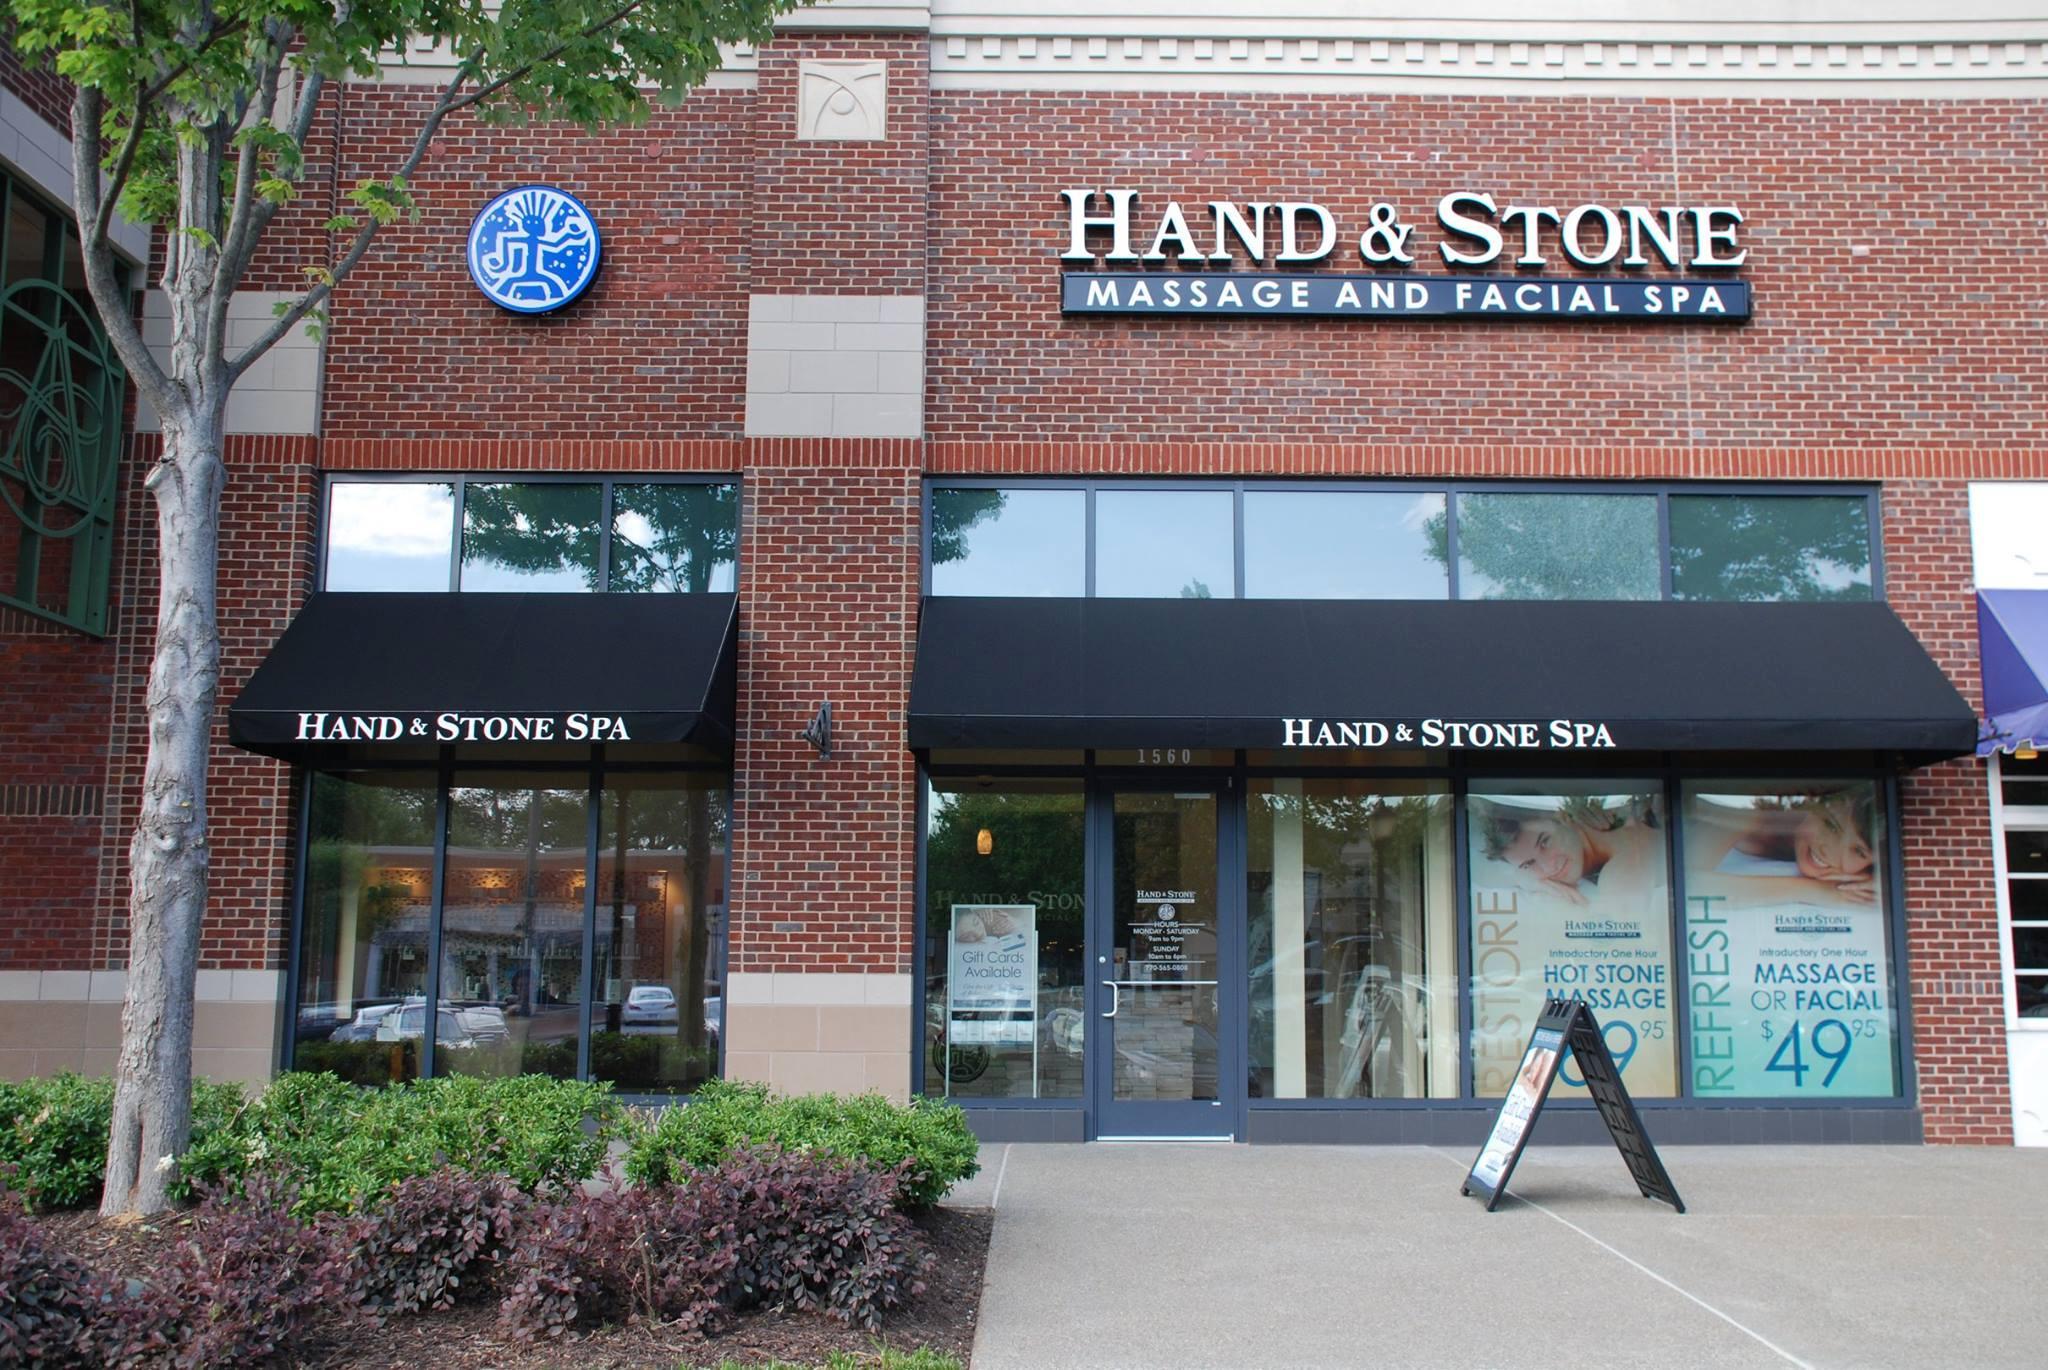 Hand & Stone storefront